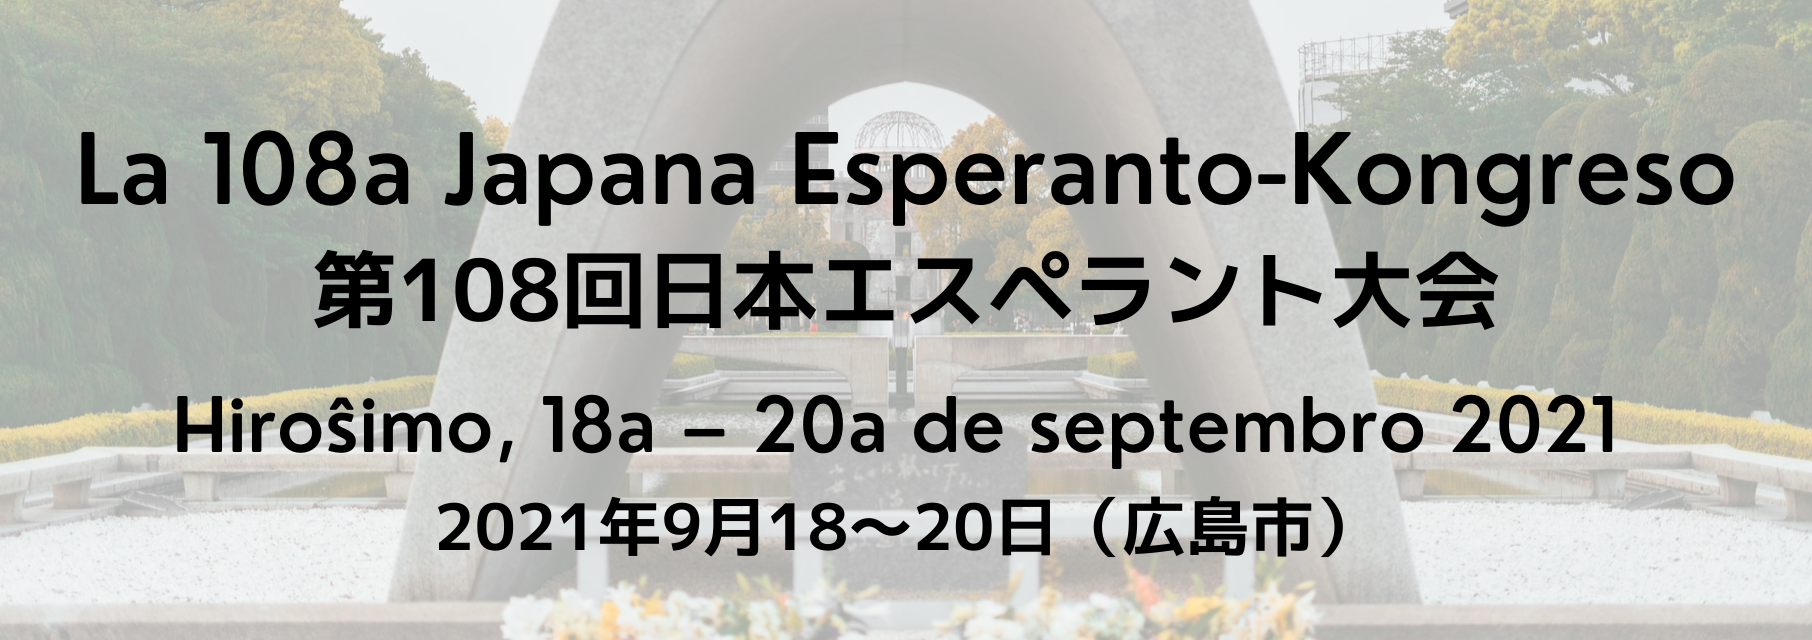 JEK2021 – 第108回日本エスペラント大会